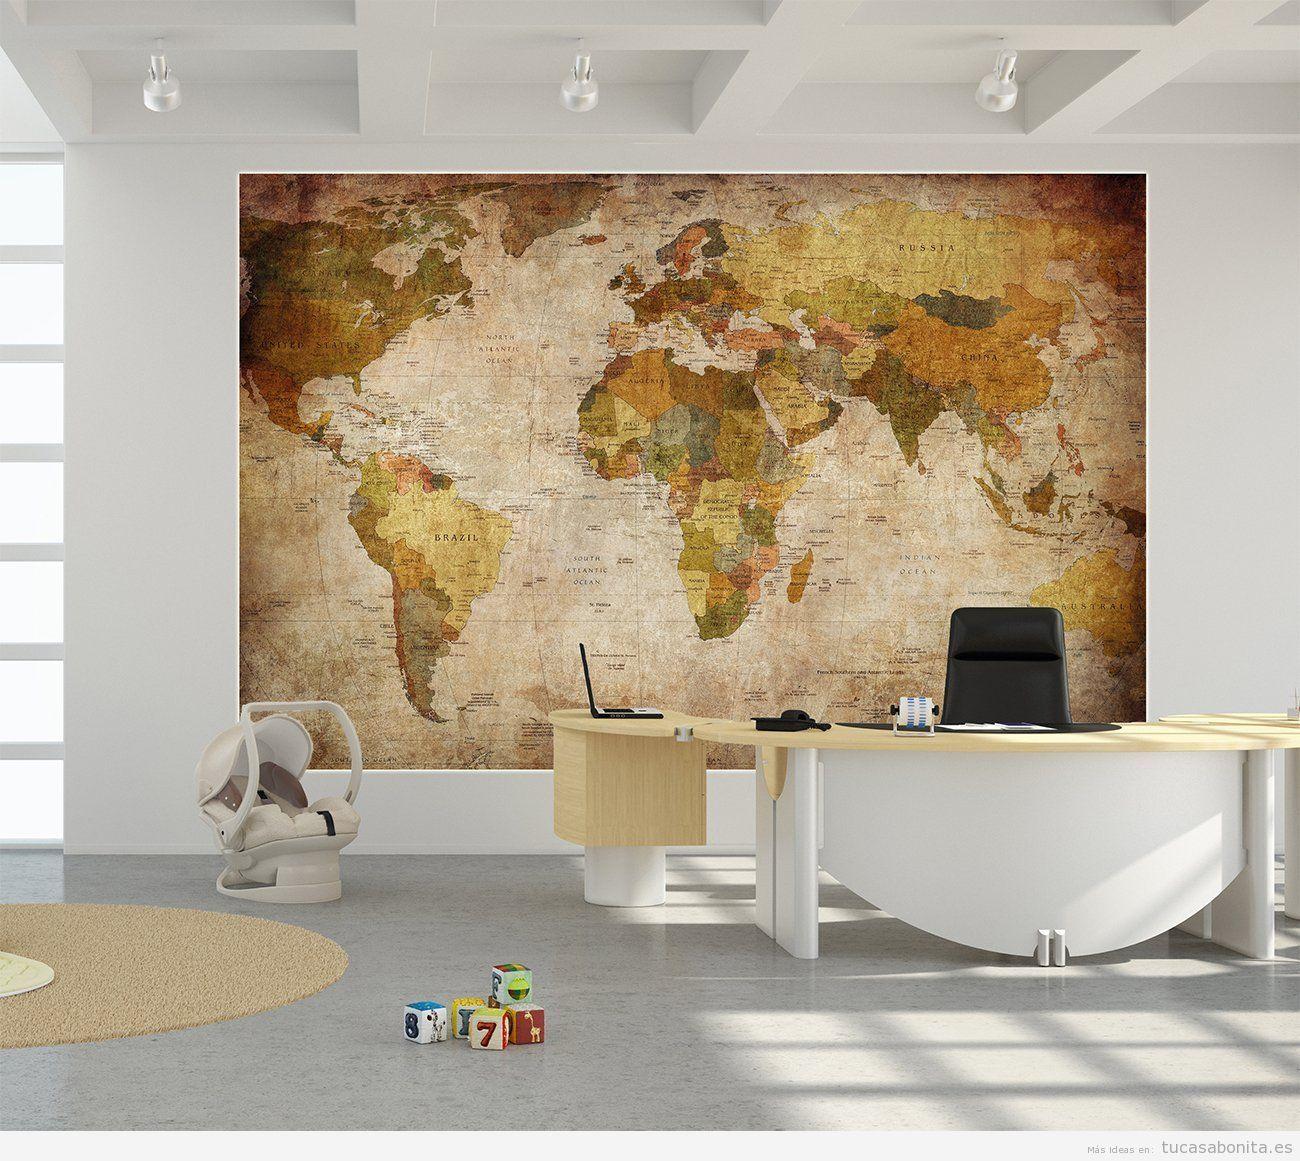 Relojes tu casa bonita ideas para decorar pisos modernos for Decoracion casa vintage online